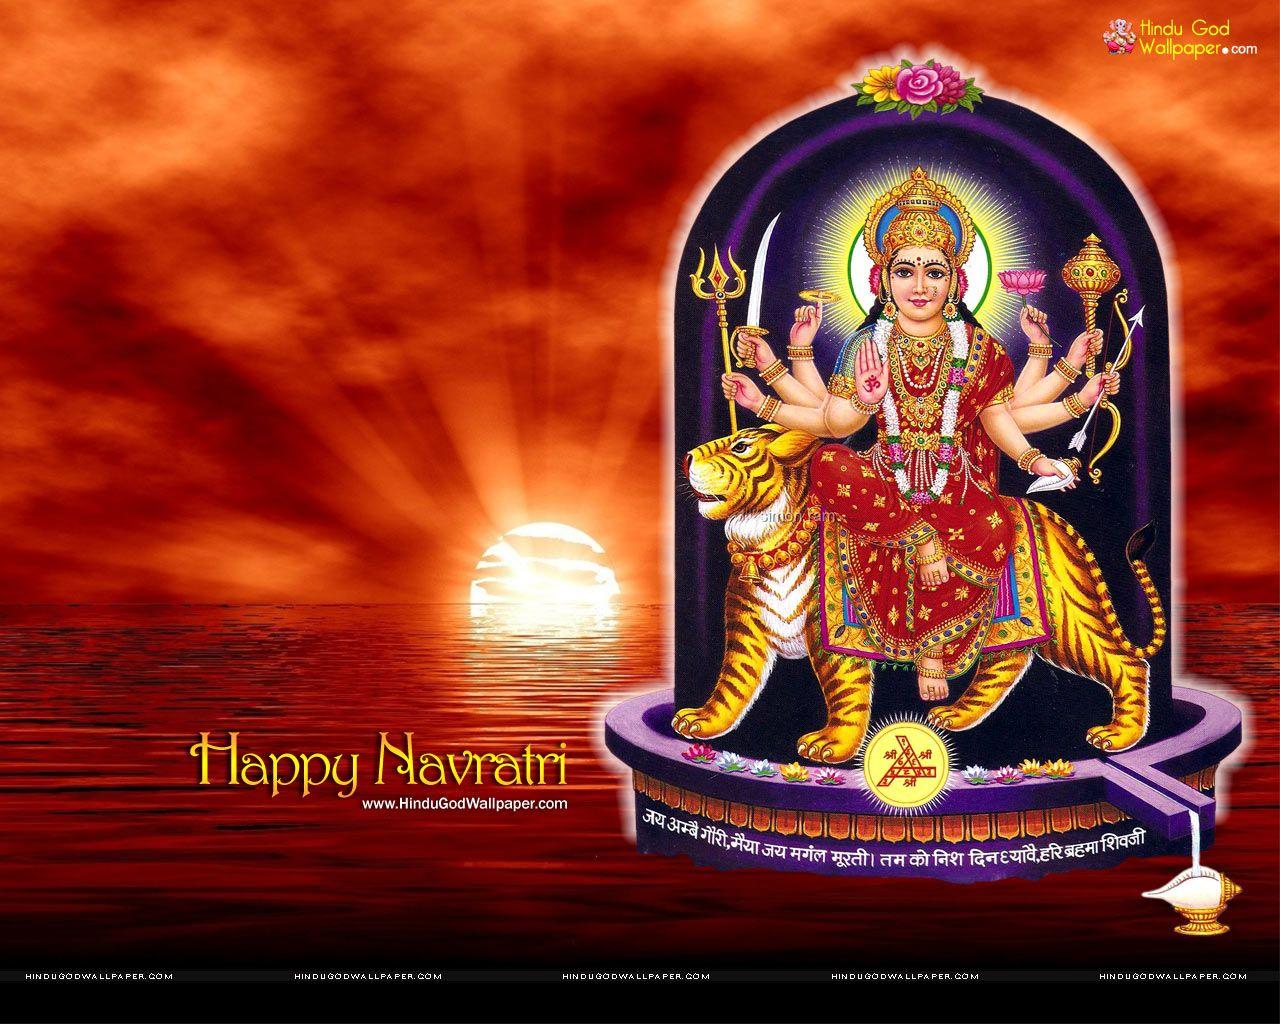 Navratri Devi Wallpapers Photos Images Free Download Navratri